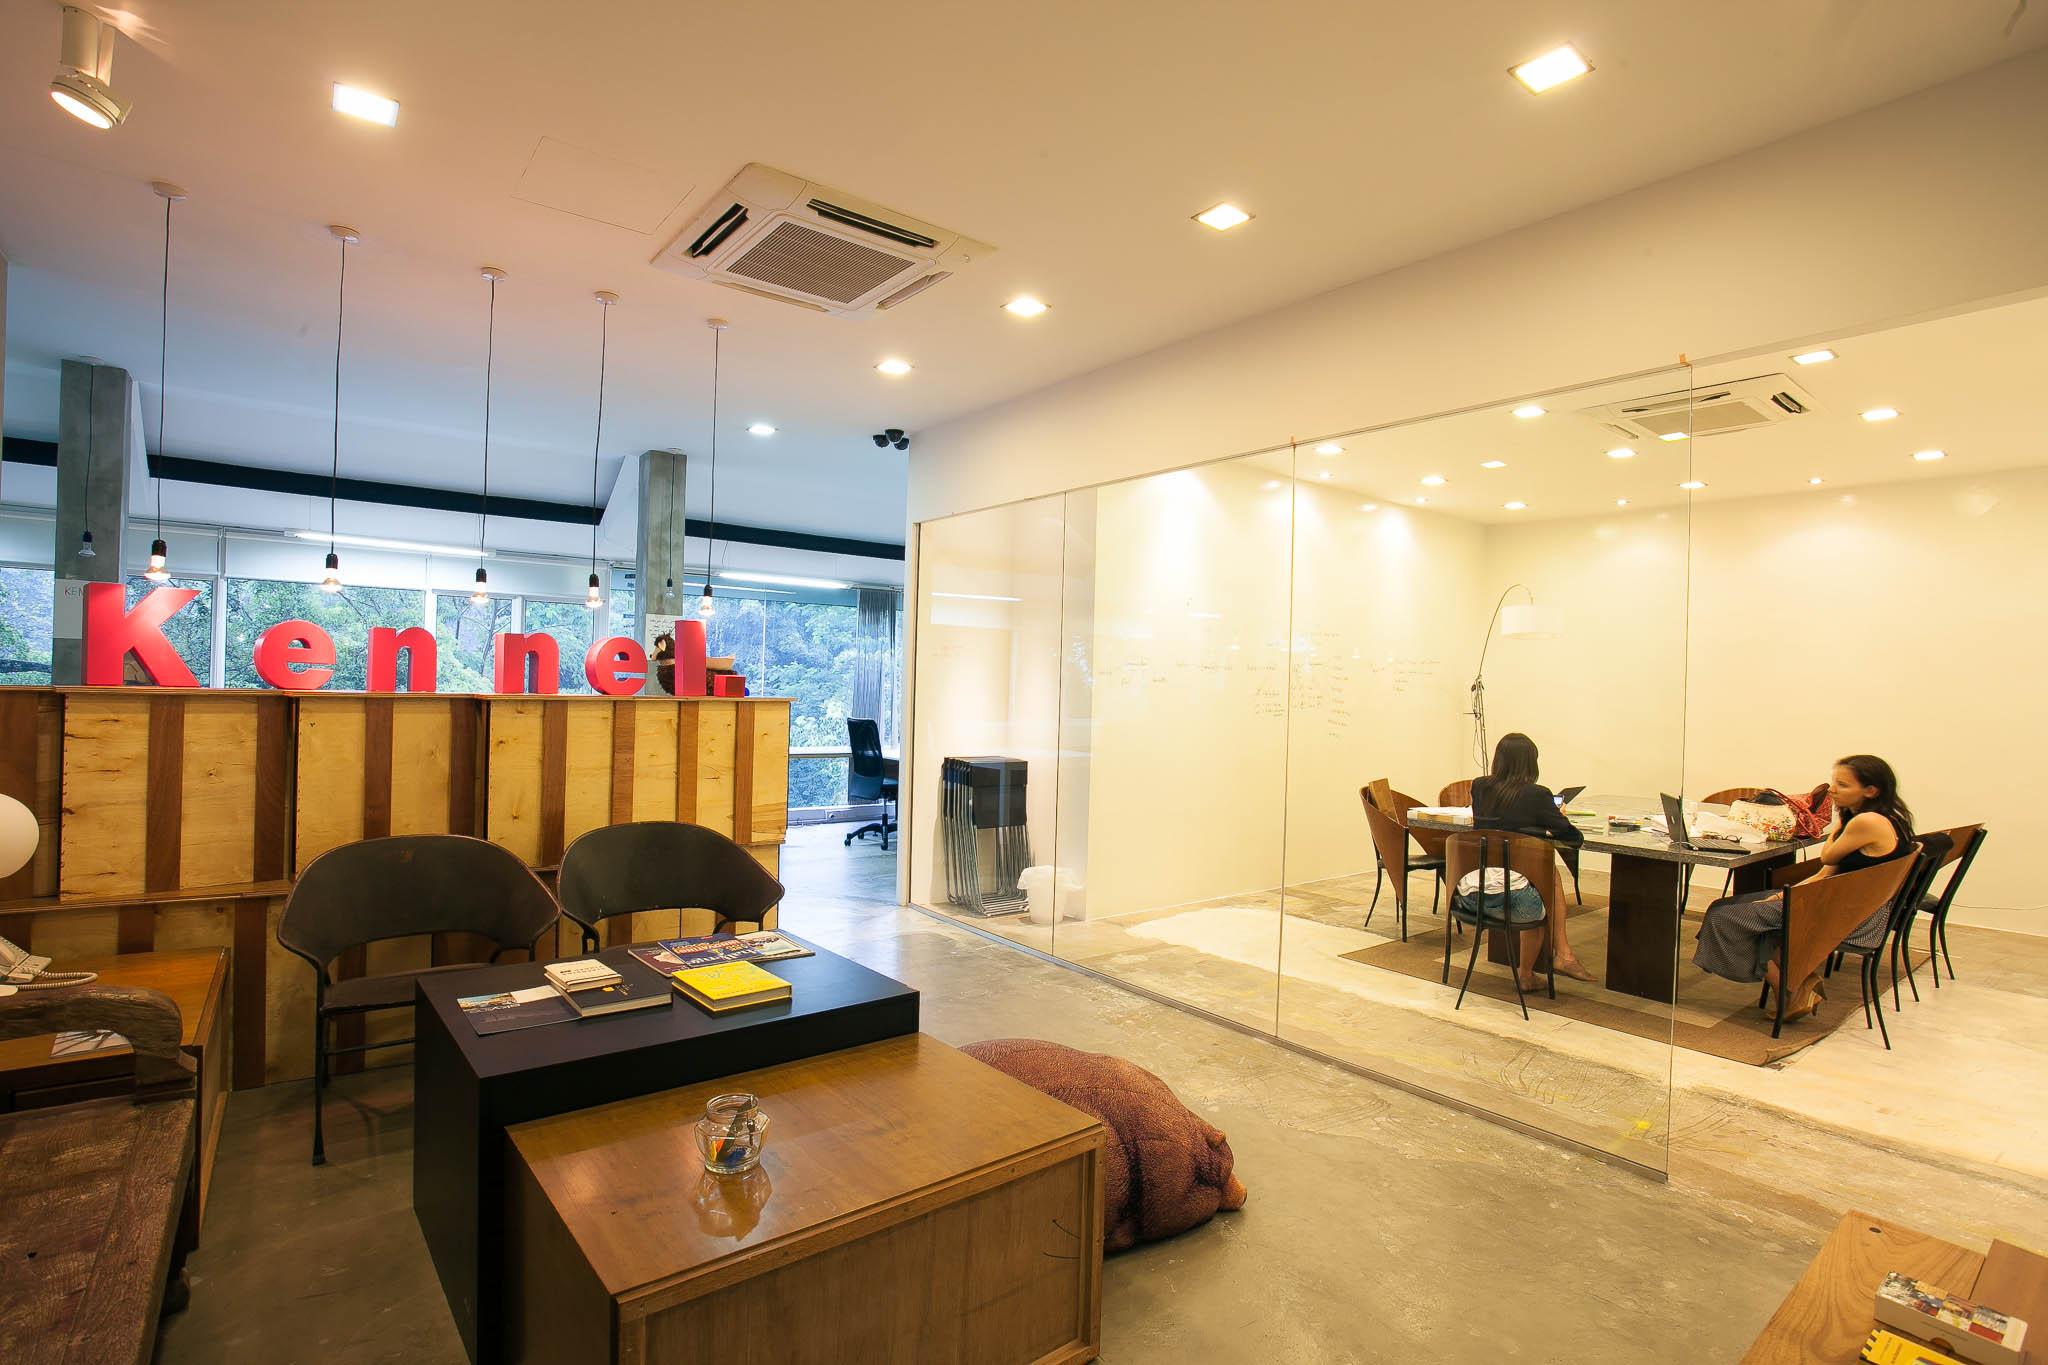 singapore-commercial-editorial-photographer-singapore-design-art4d-bangkok-thailand-zakaria-zainal-14.jpg